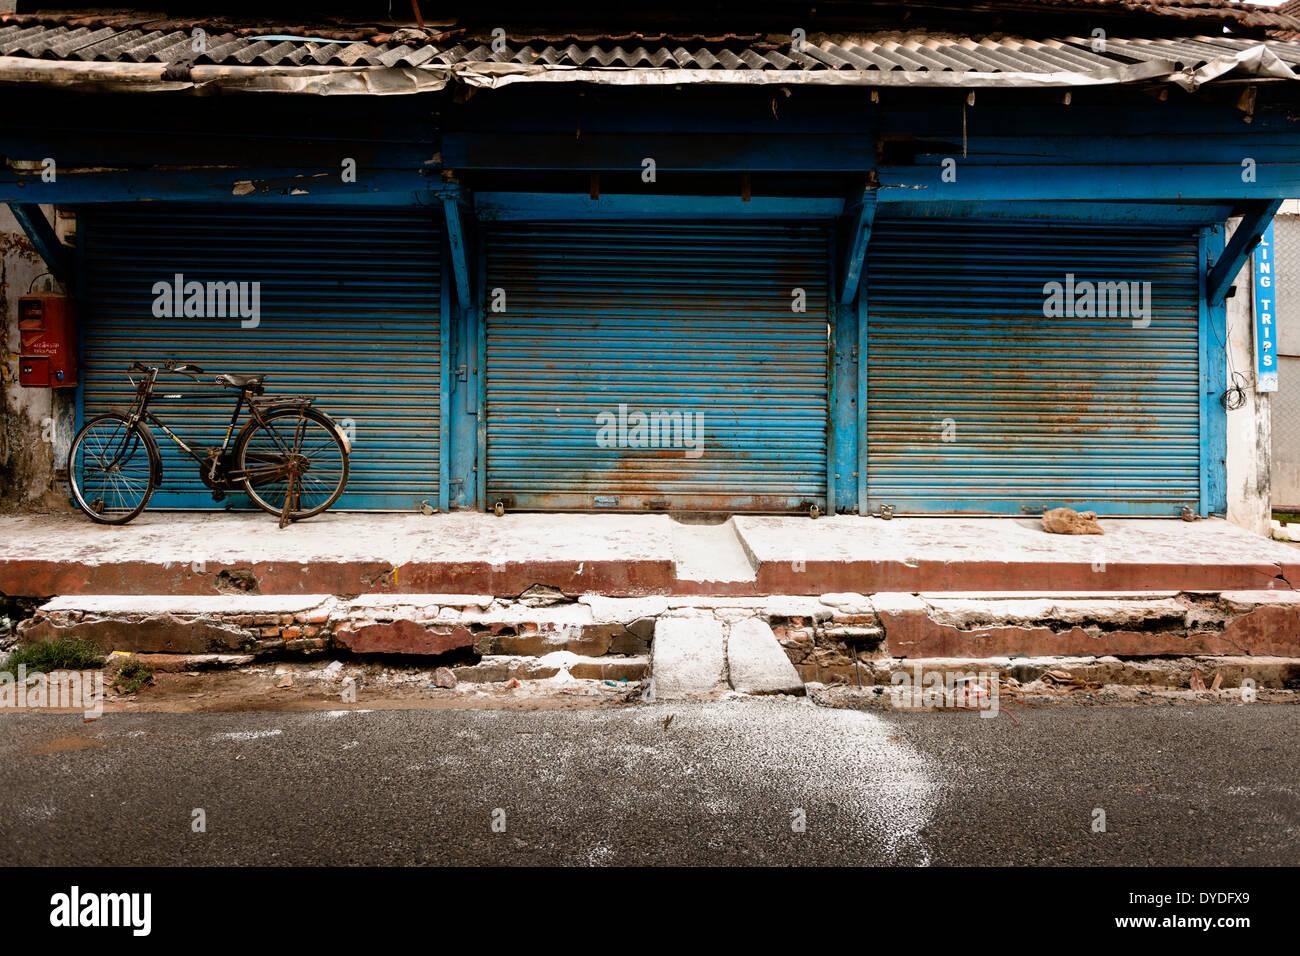 Fort Kochi. - Stock Image